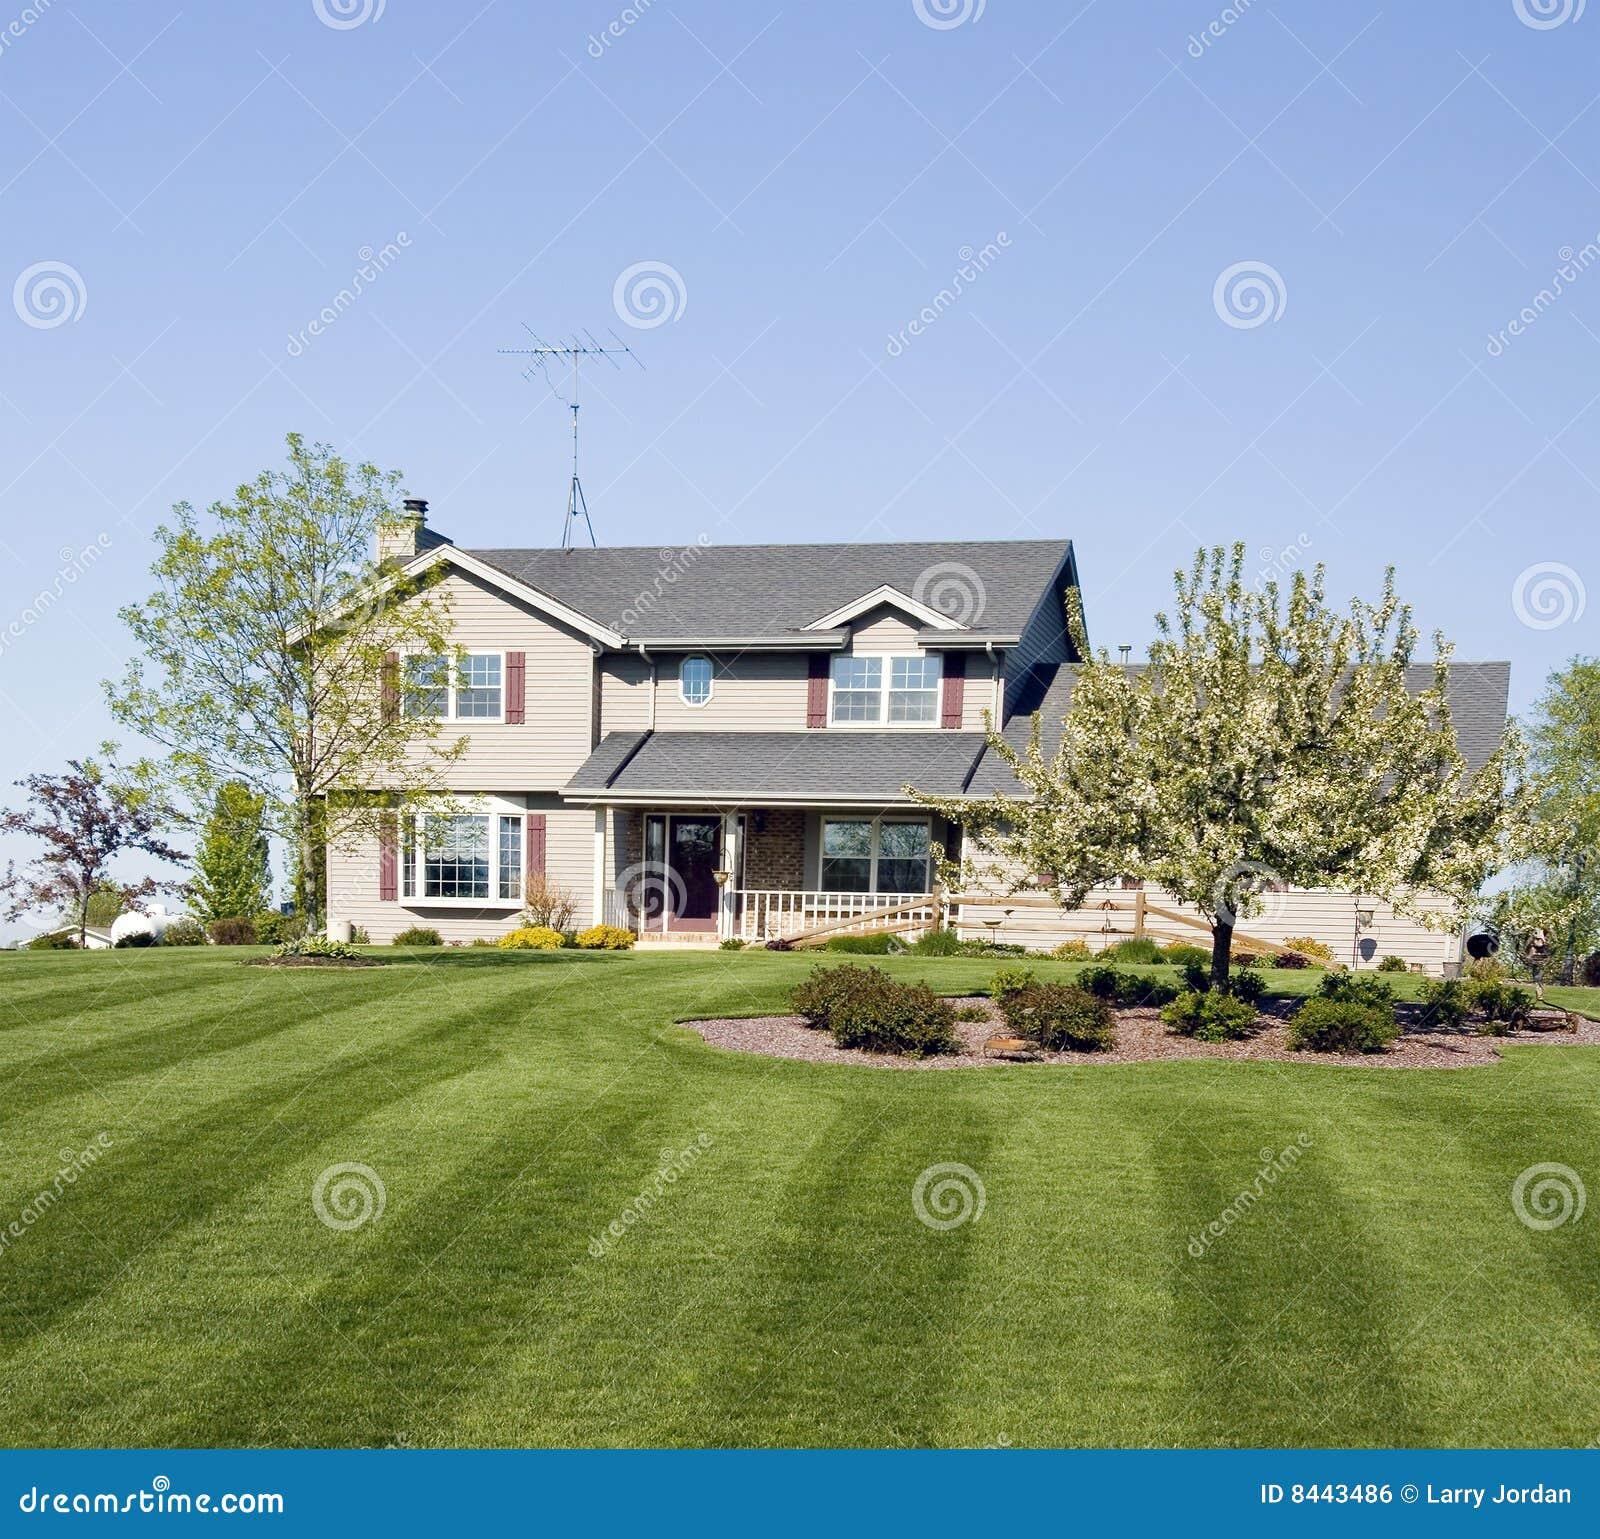 Upscale Surburban Home